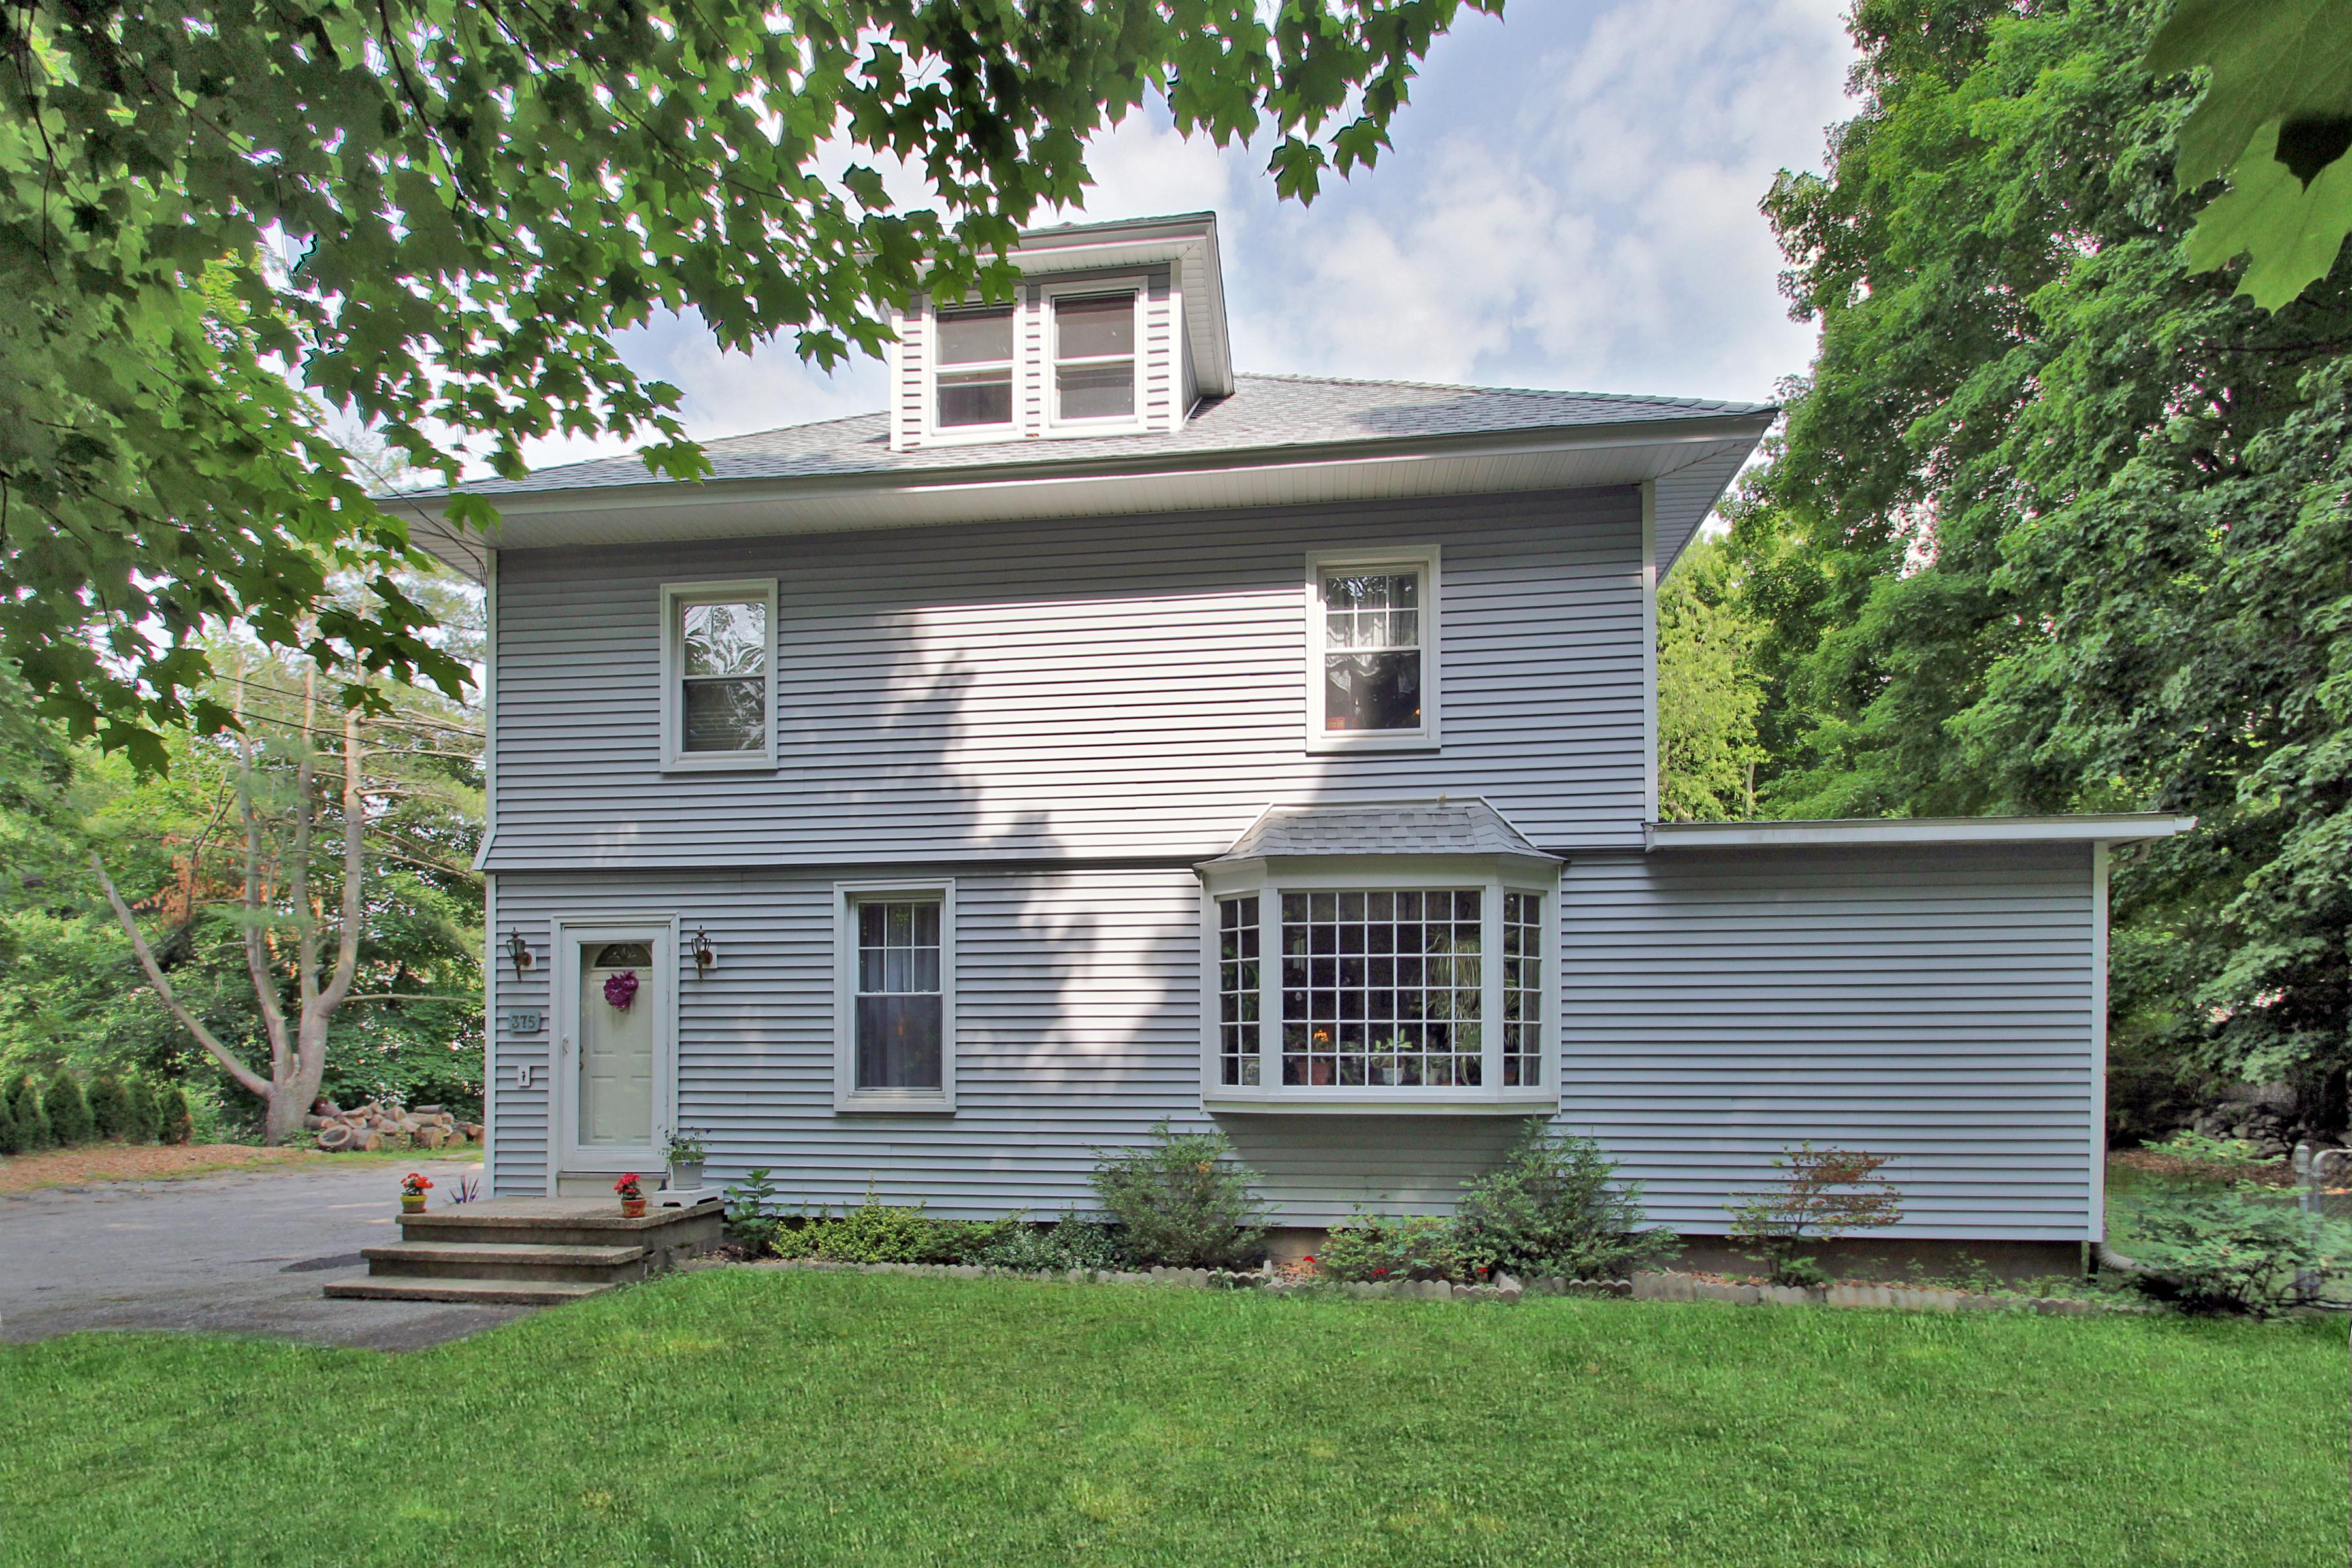 Moradia para Venda às Charming Cranbury Farmhouse 375 Newtown Avenue Norwalk, Connecticut 06851 Estados Unidos